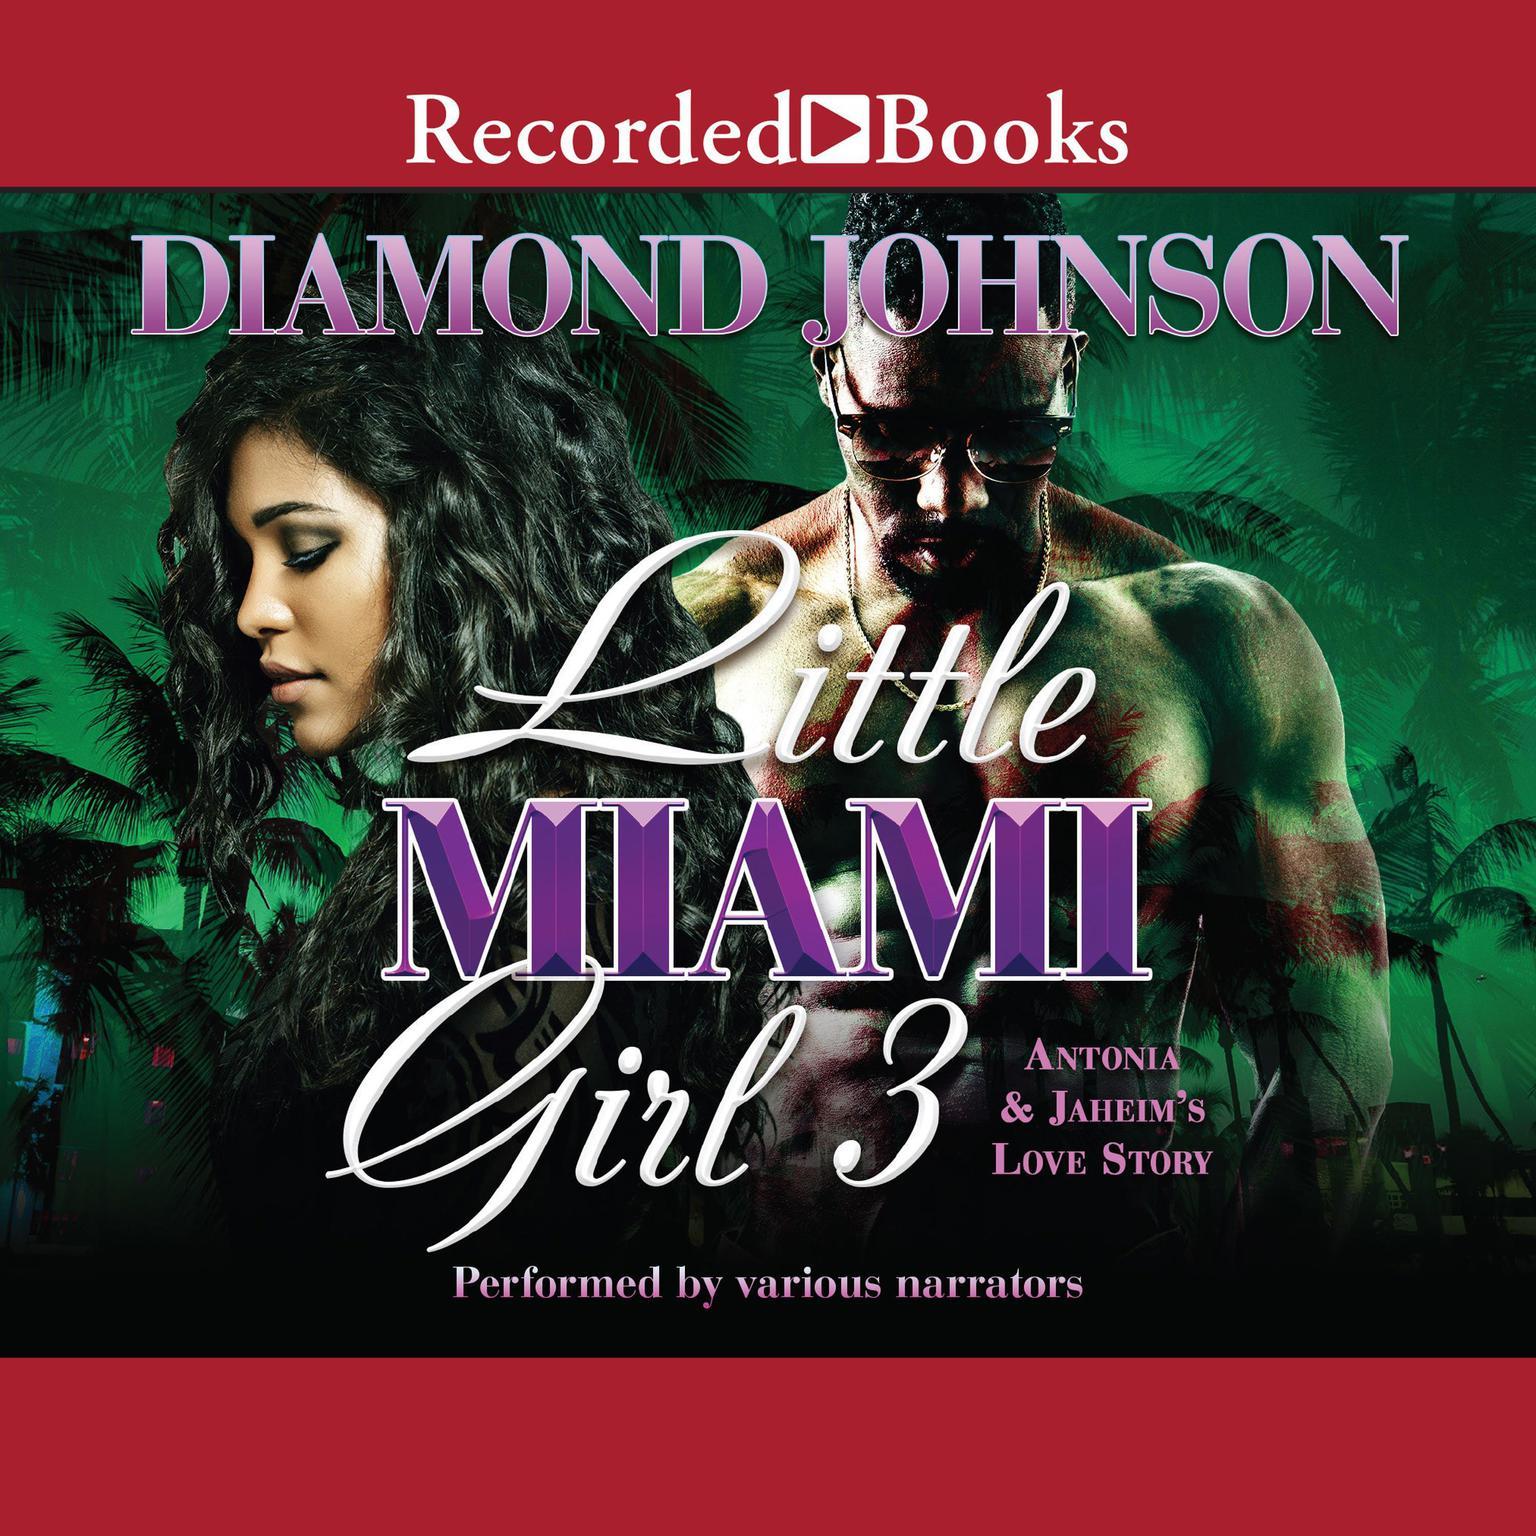 Little Miami Girl 3: Antonia and Jahiems Love Story Audiobook, by Diamond Johnson